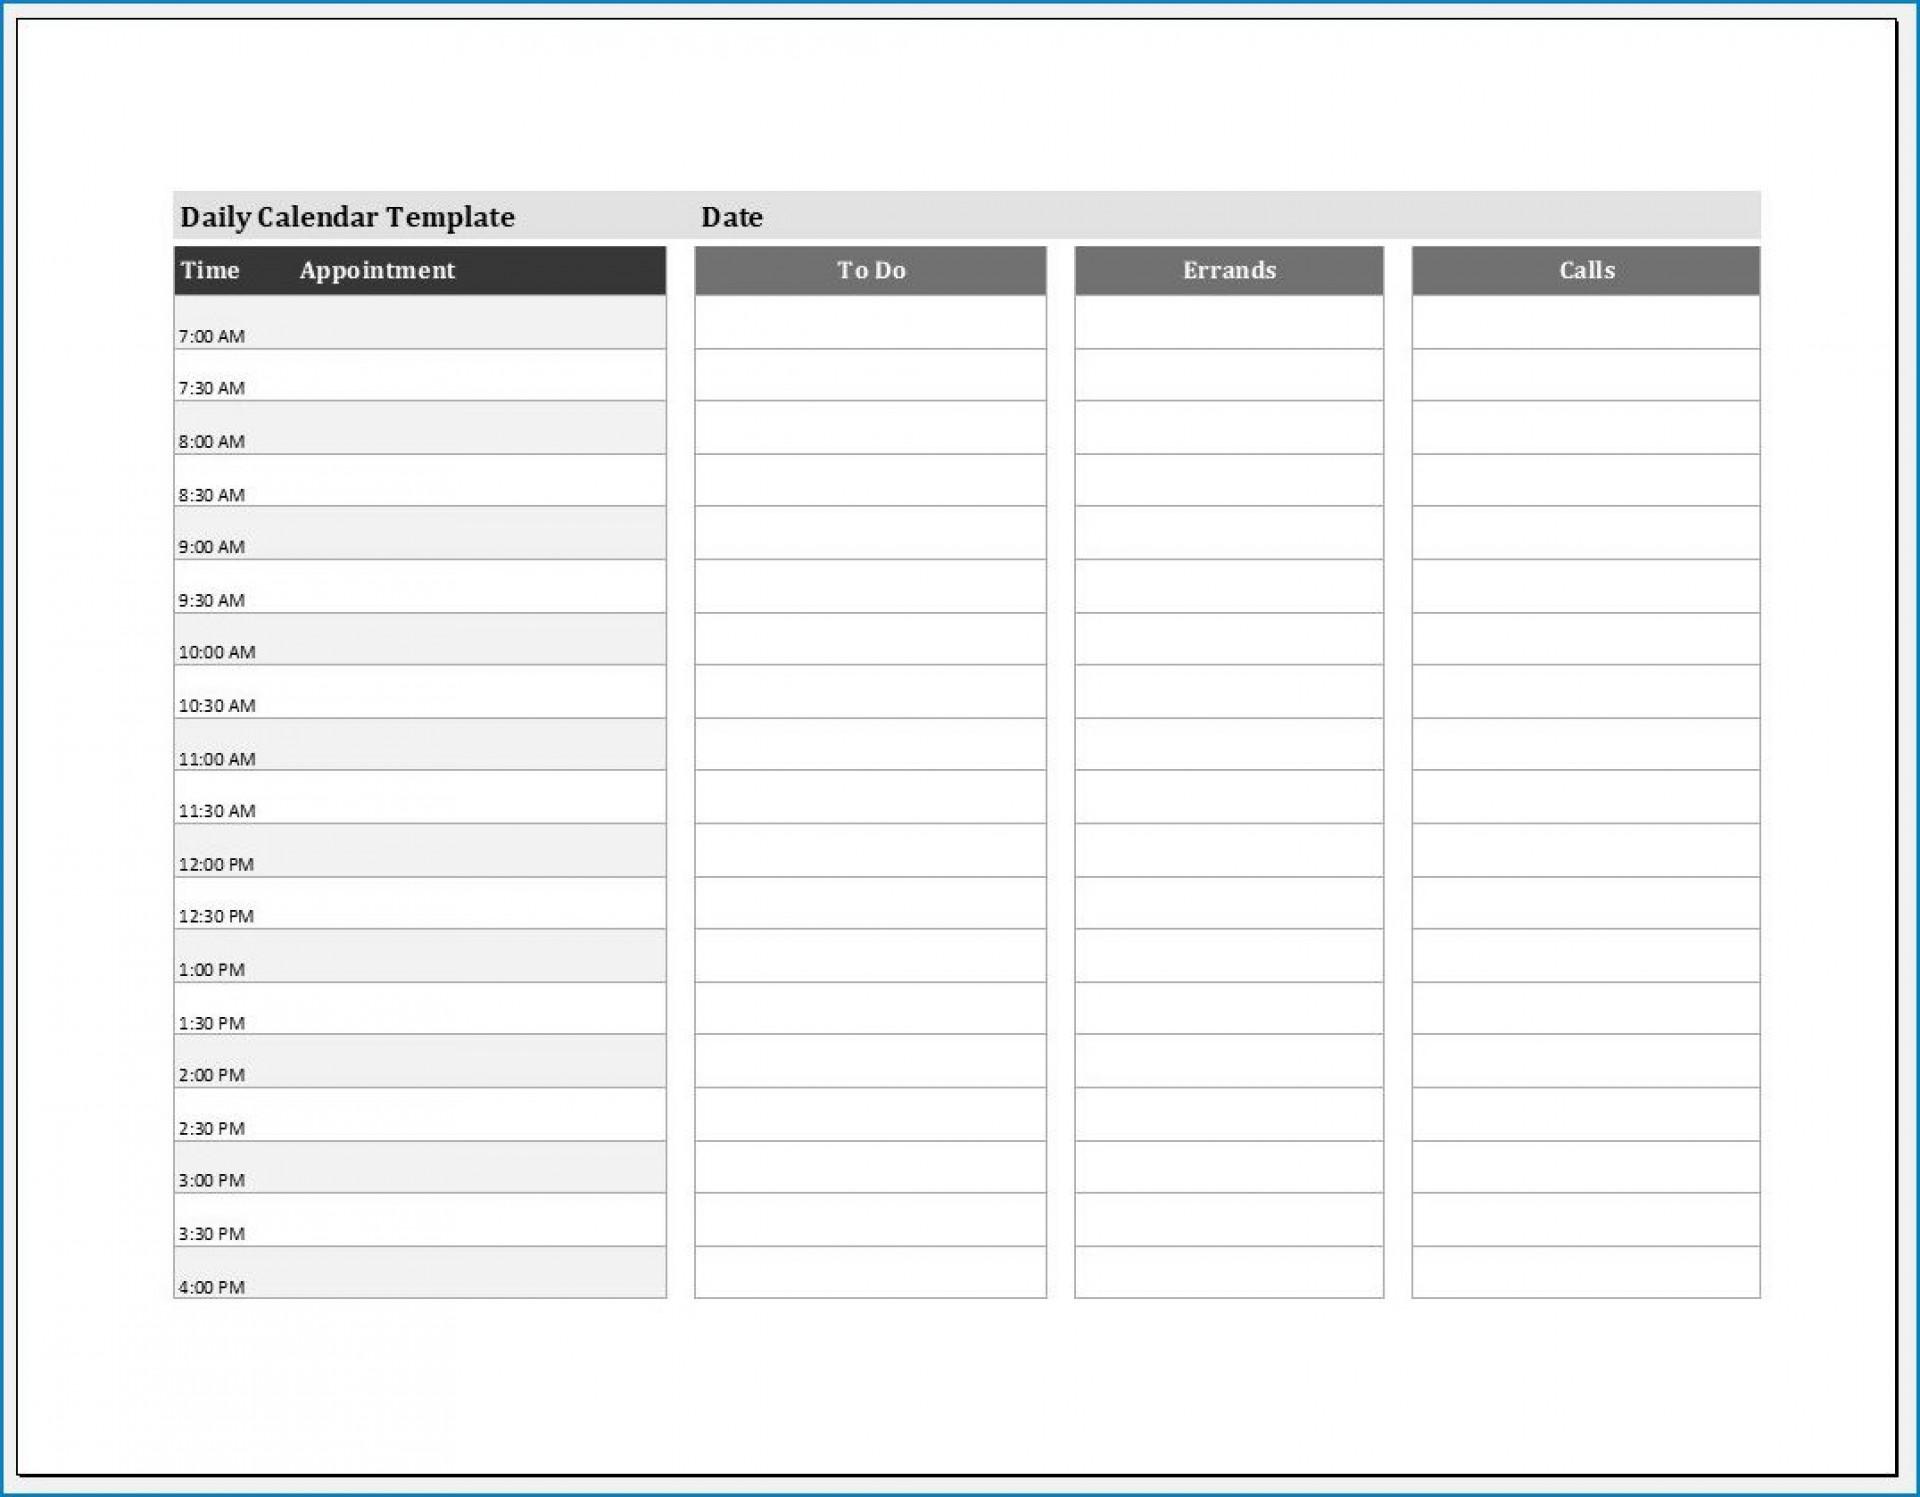 004 Shocking Daily Calendar Template Excel High Def 1920